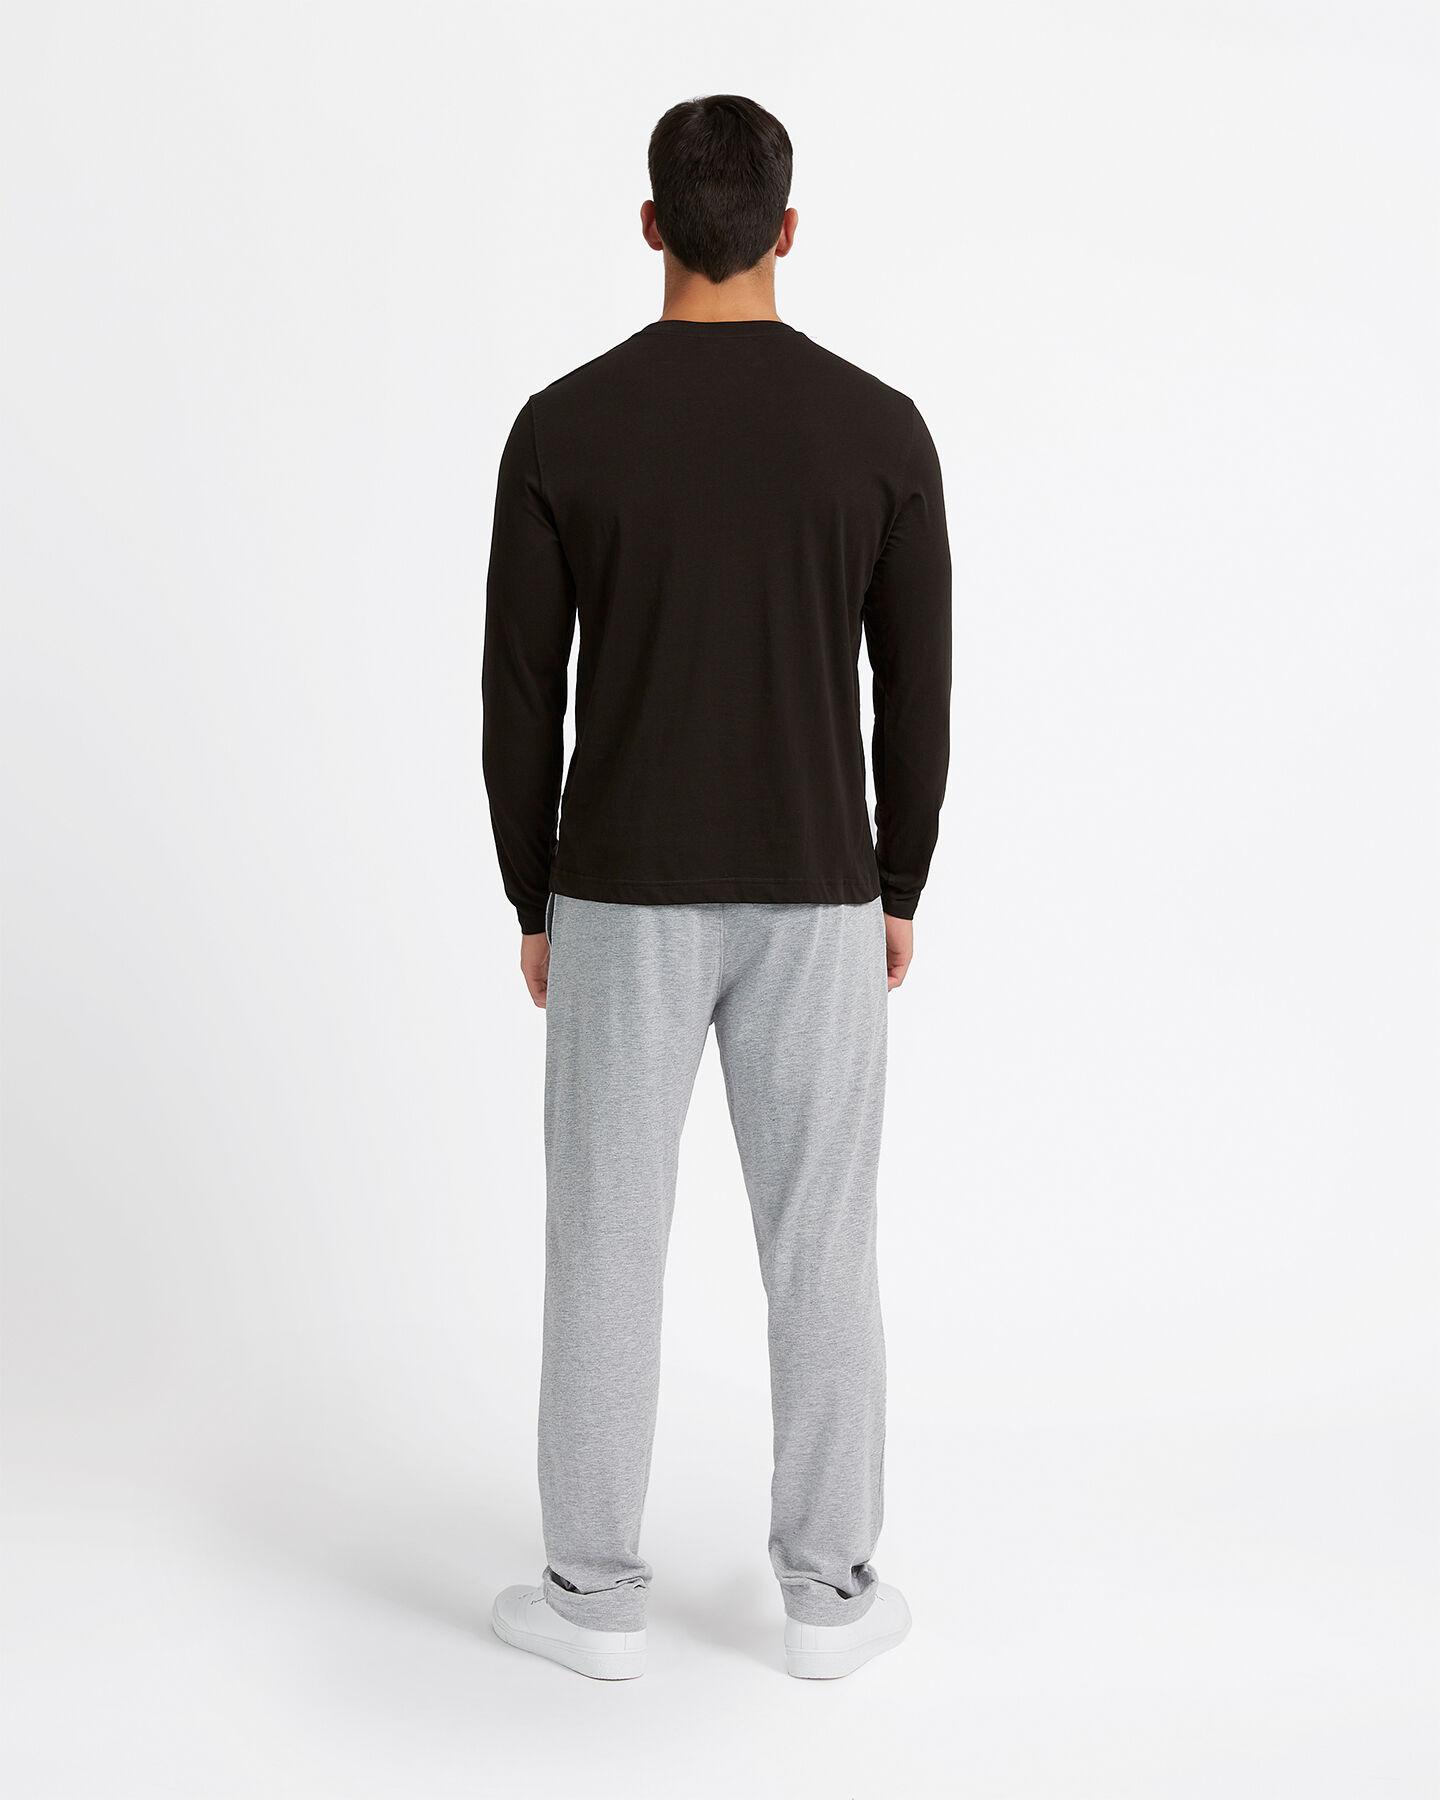 T-Shirt ABC GIROCOLLO M S4030755 scatto 2